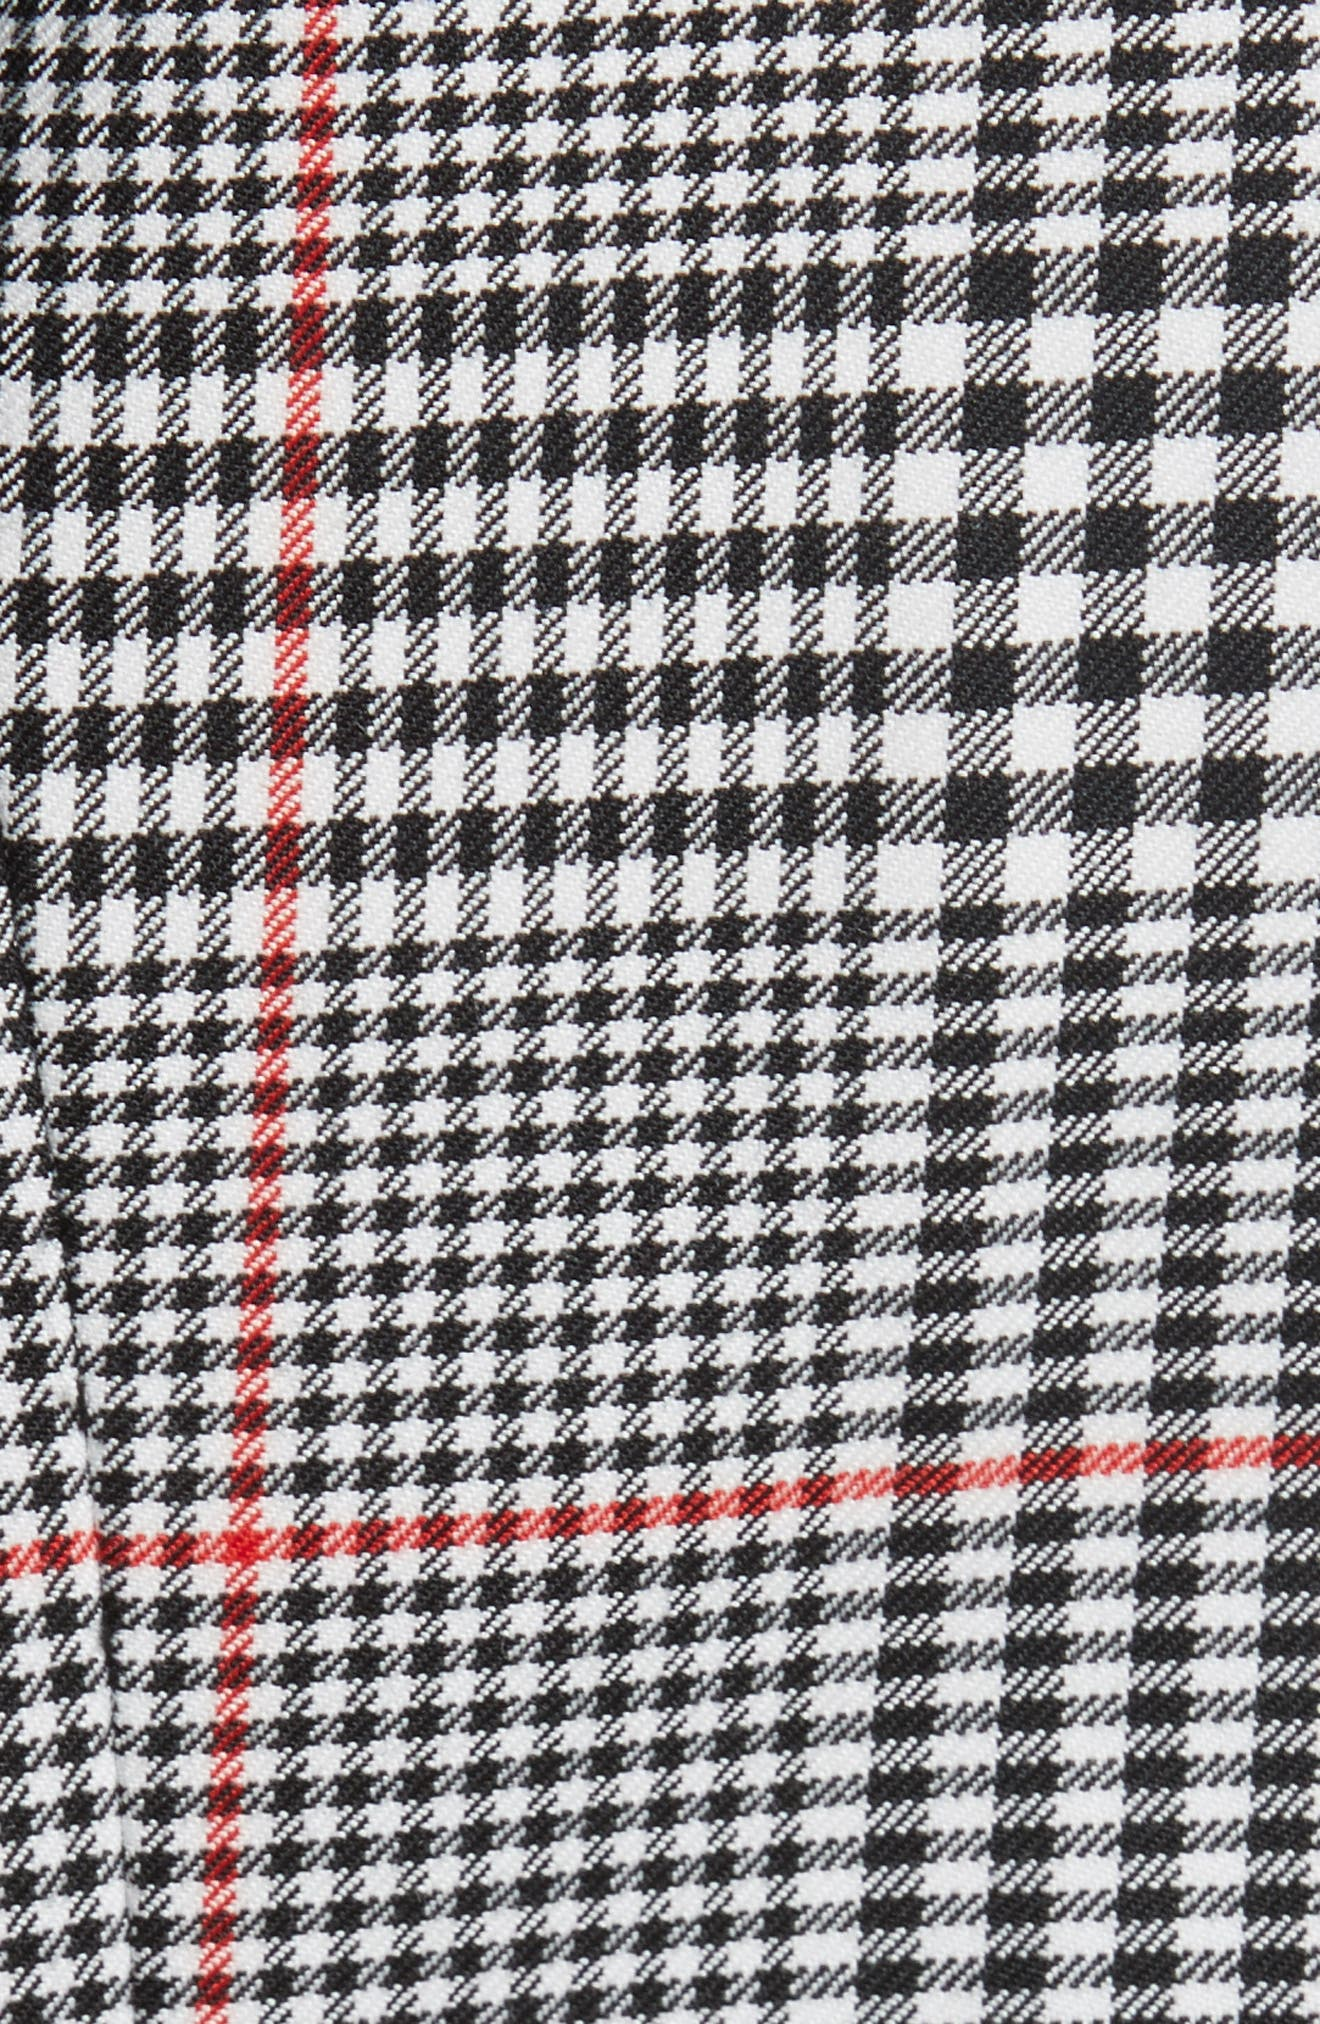 Glen Plaid Jacket Dress,                             Alternate thumbnail 6, color,                             001